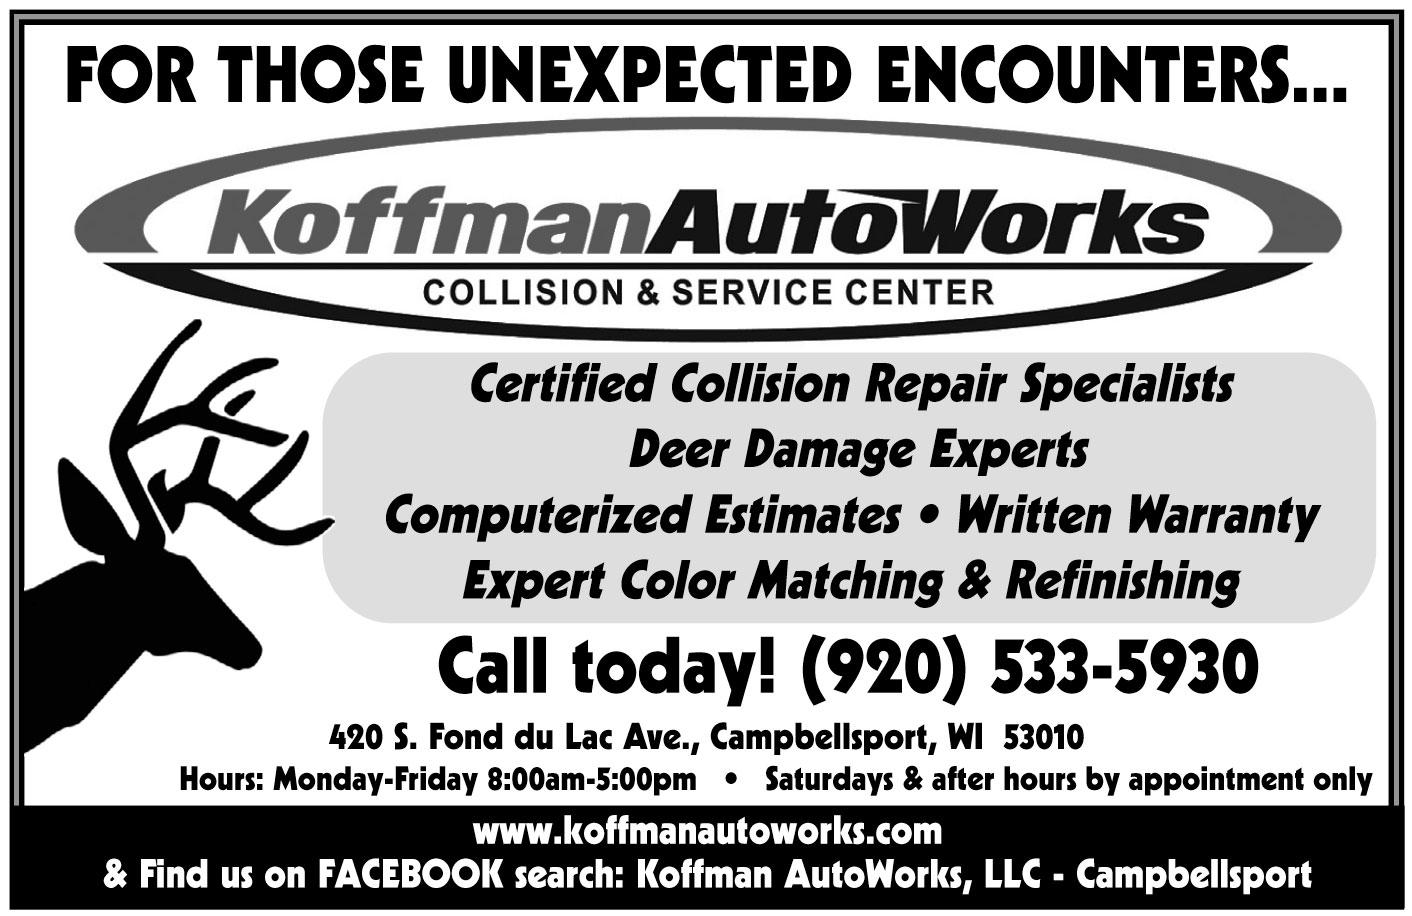 Koffman Autoworks